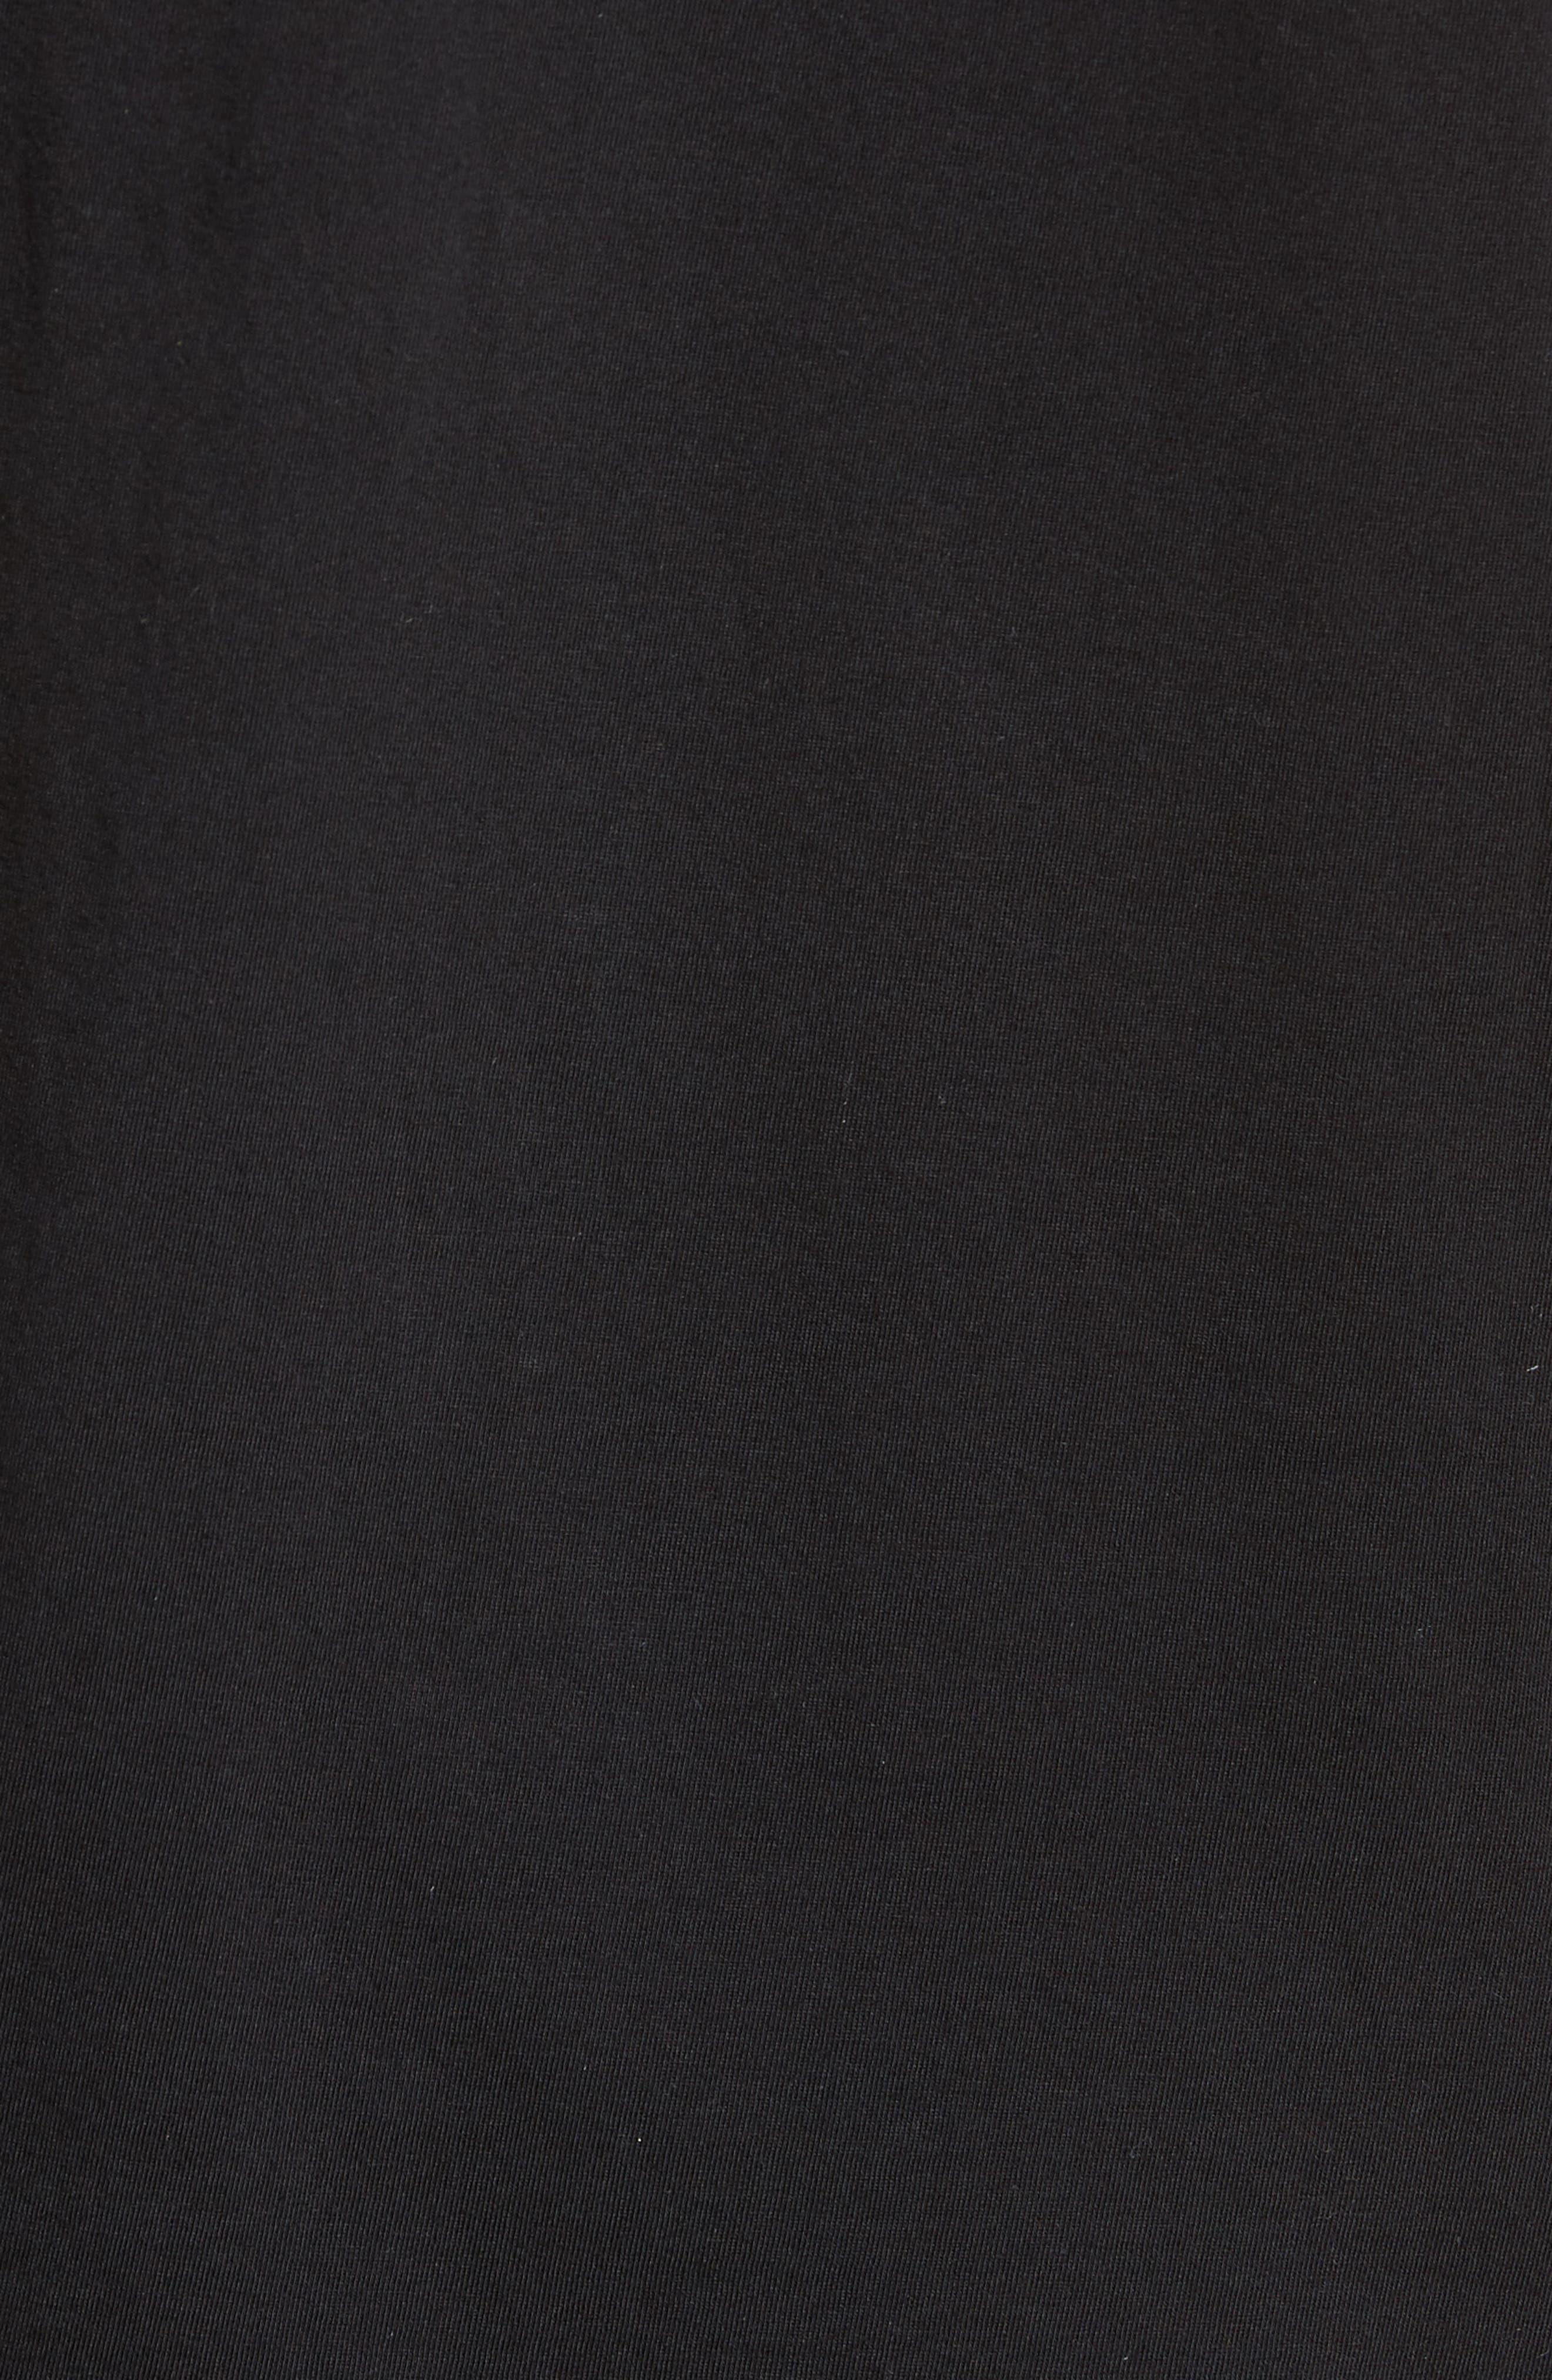 Outline Graphic T-Shirt,                             Alternate thumbnail 5, color,                             Black